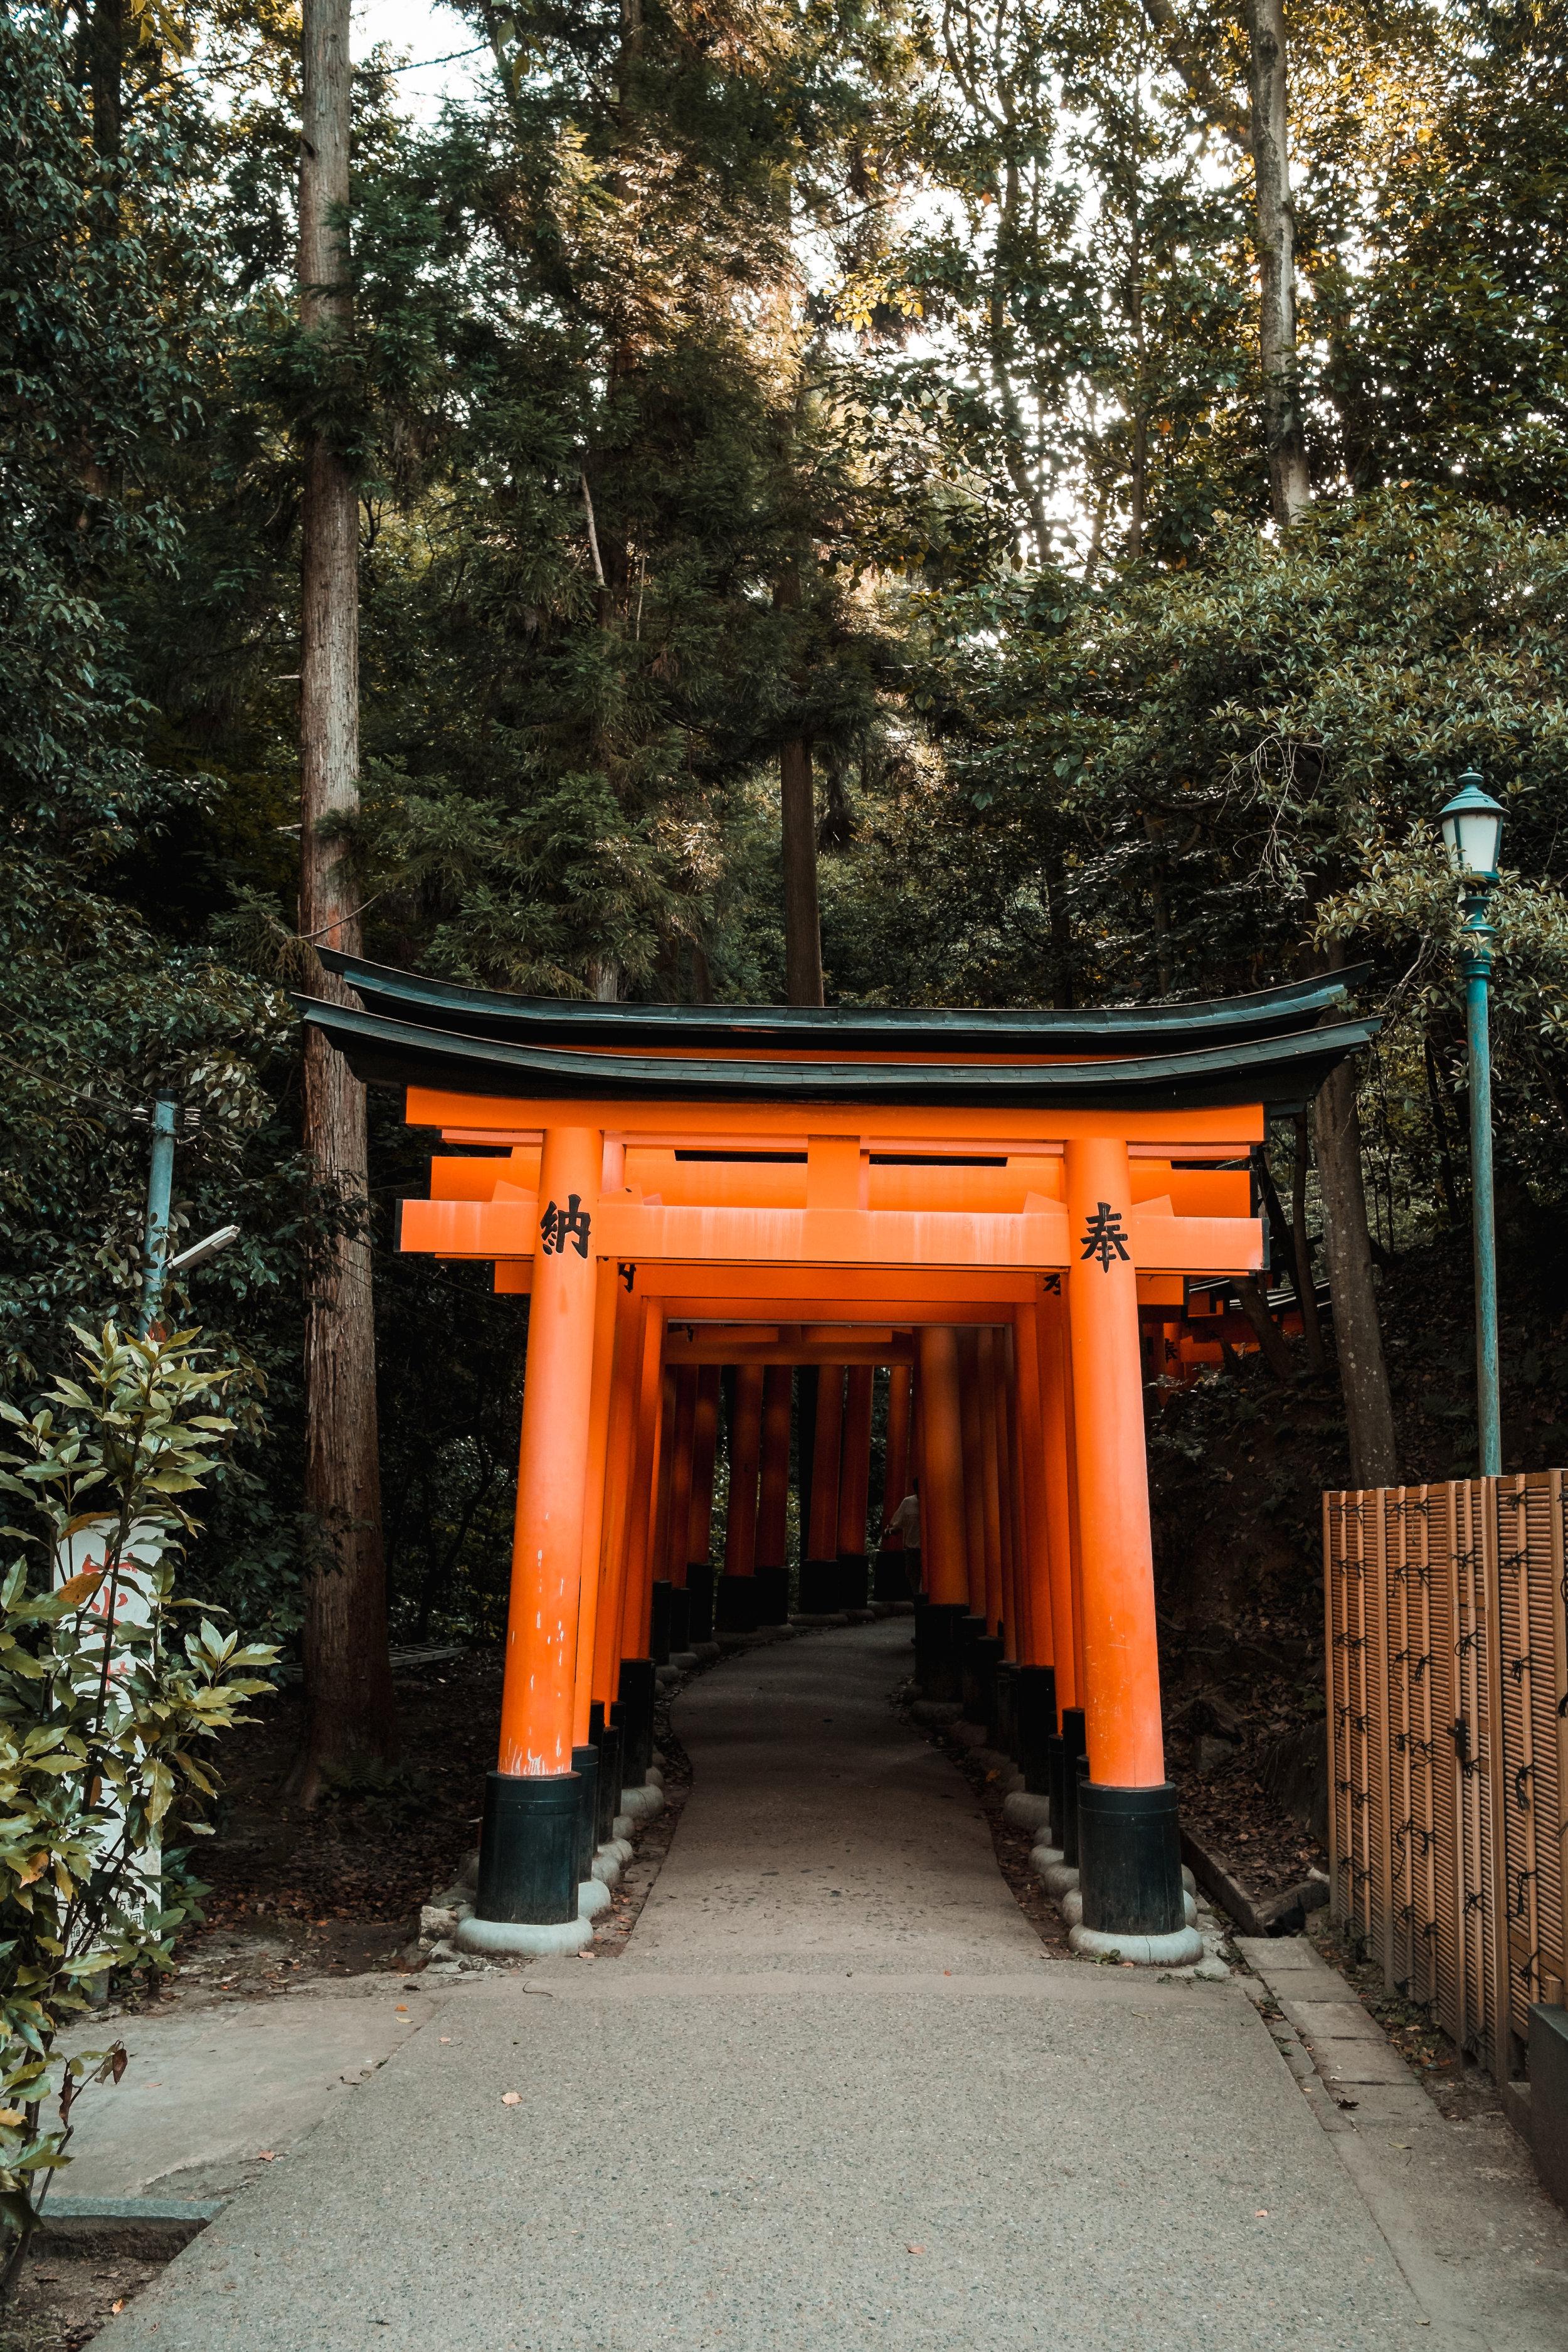 KyotoJapan_2018_AdamDillon_DSCF0047.jpg